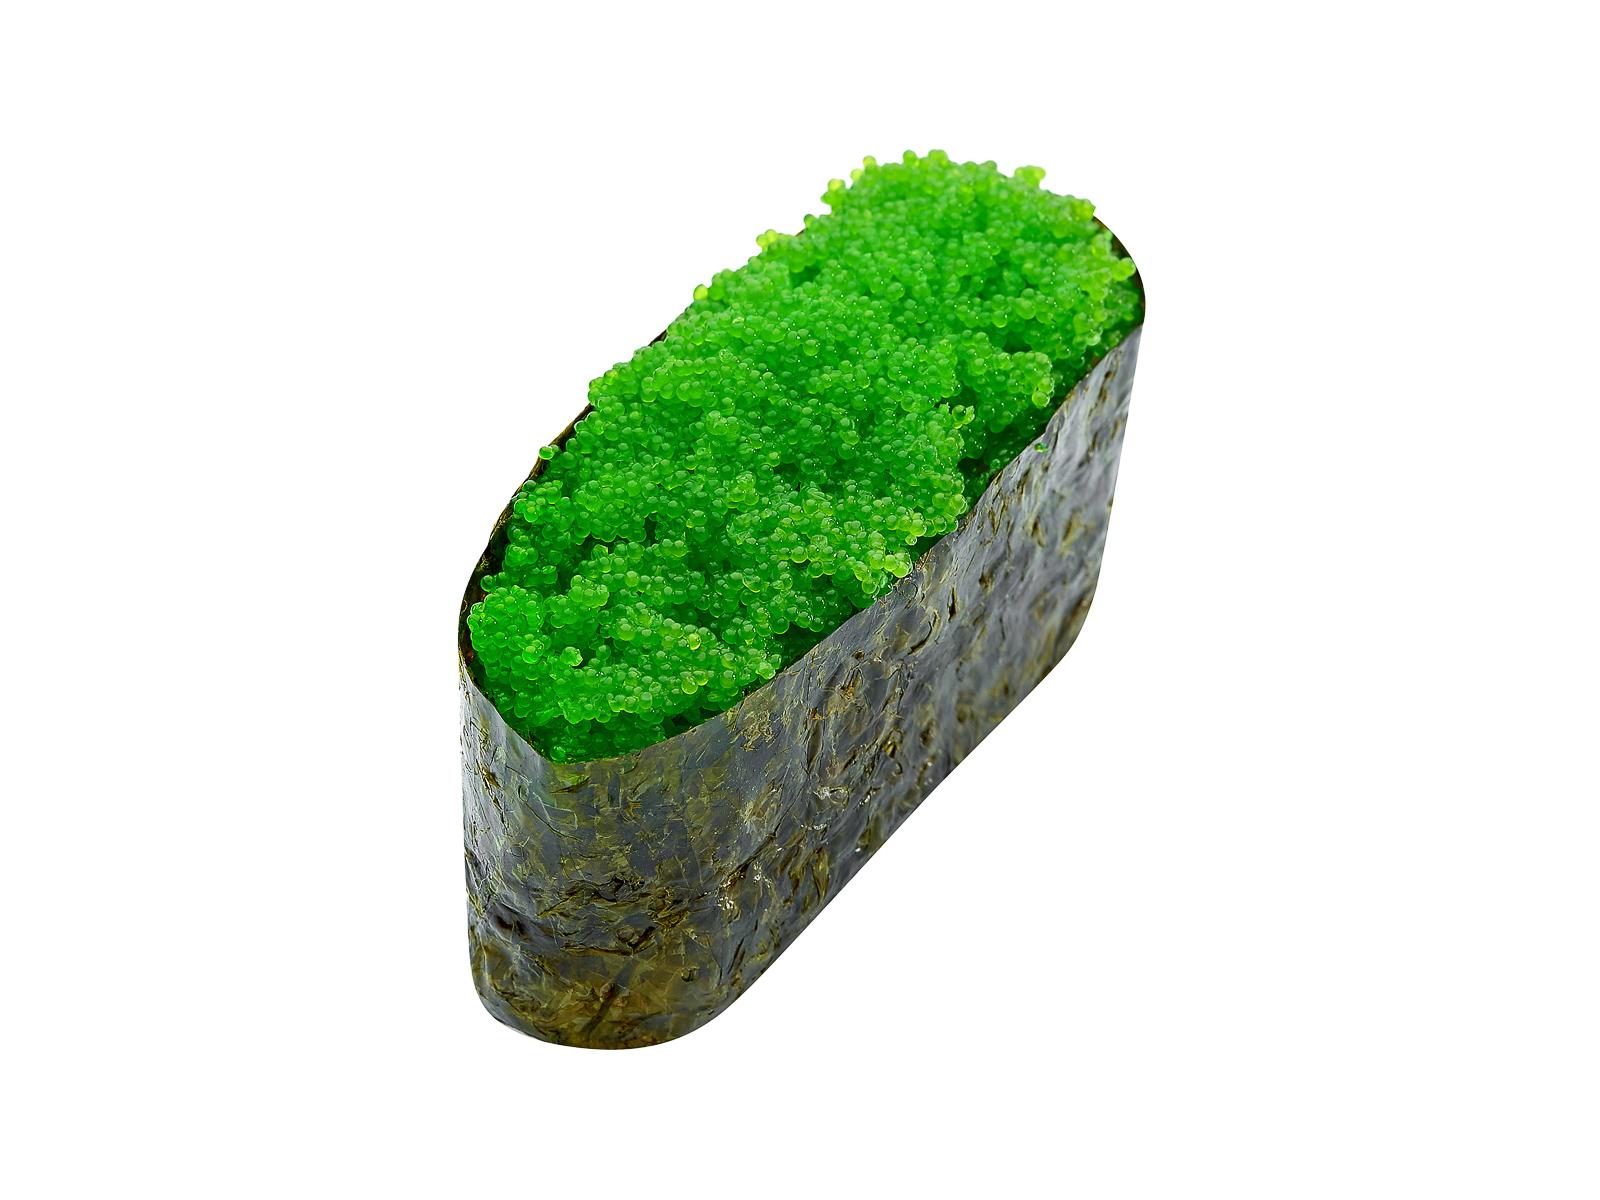 Суши с зелёной масаго